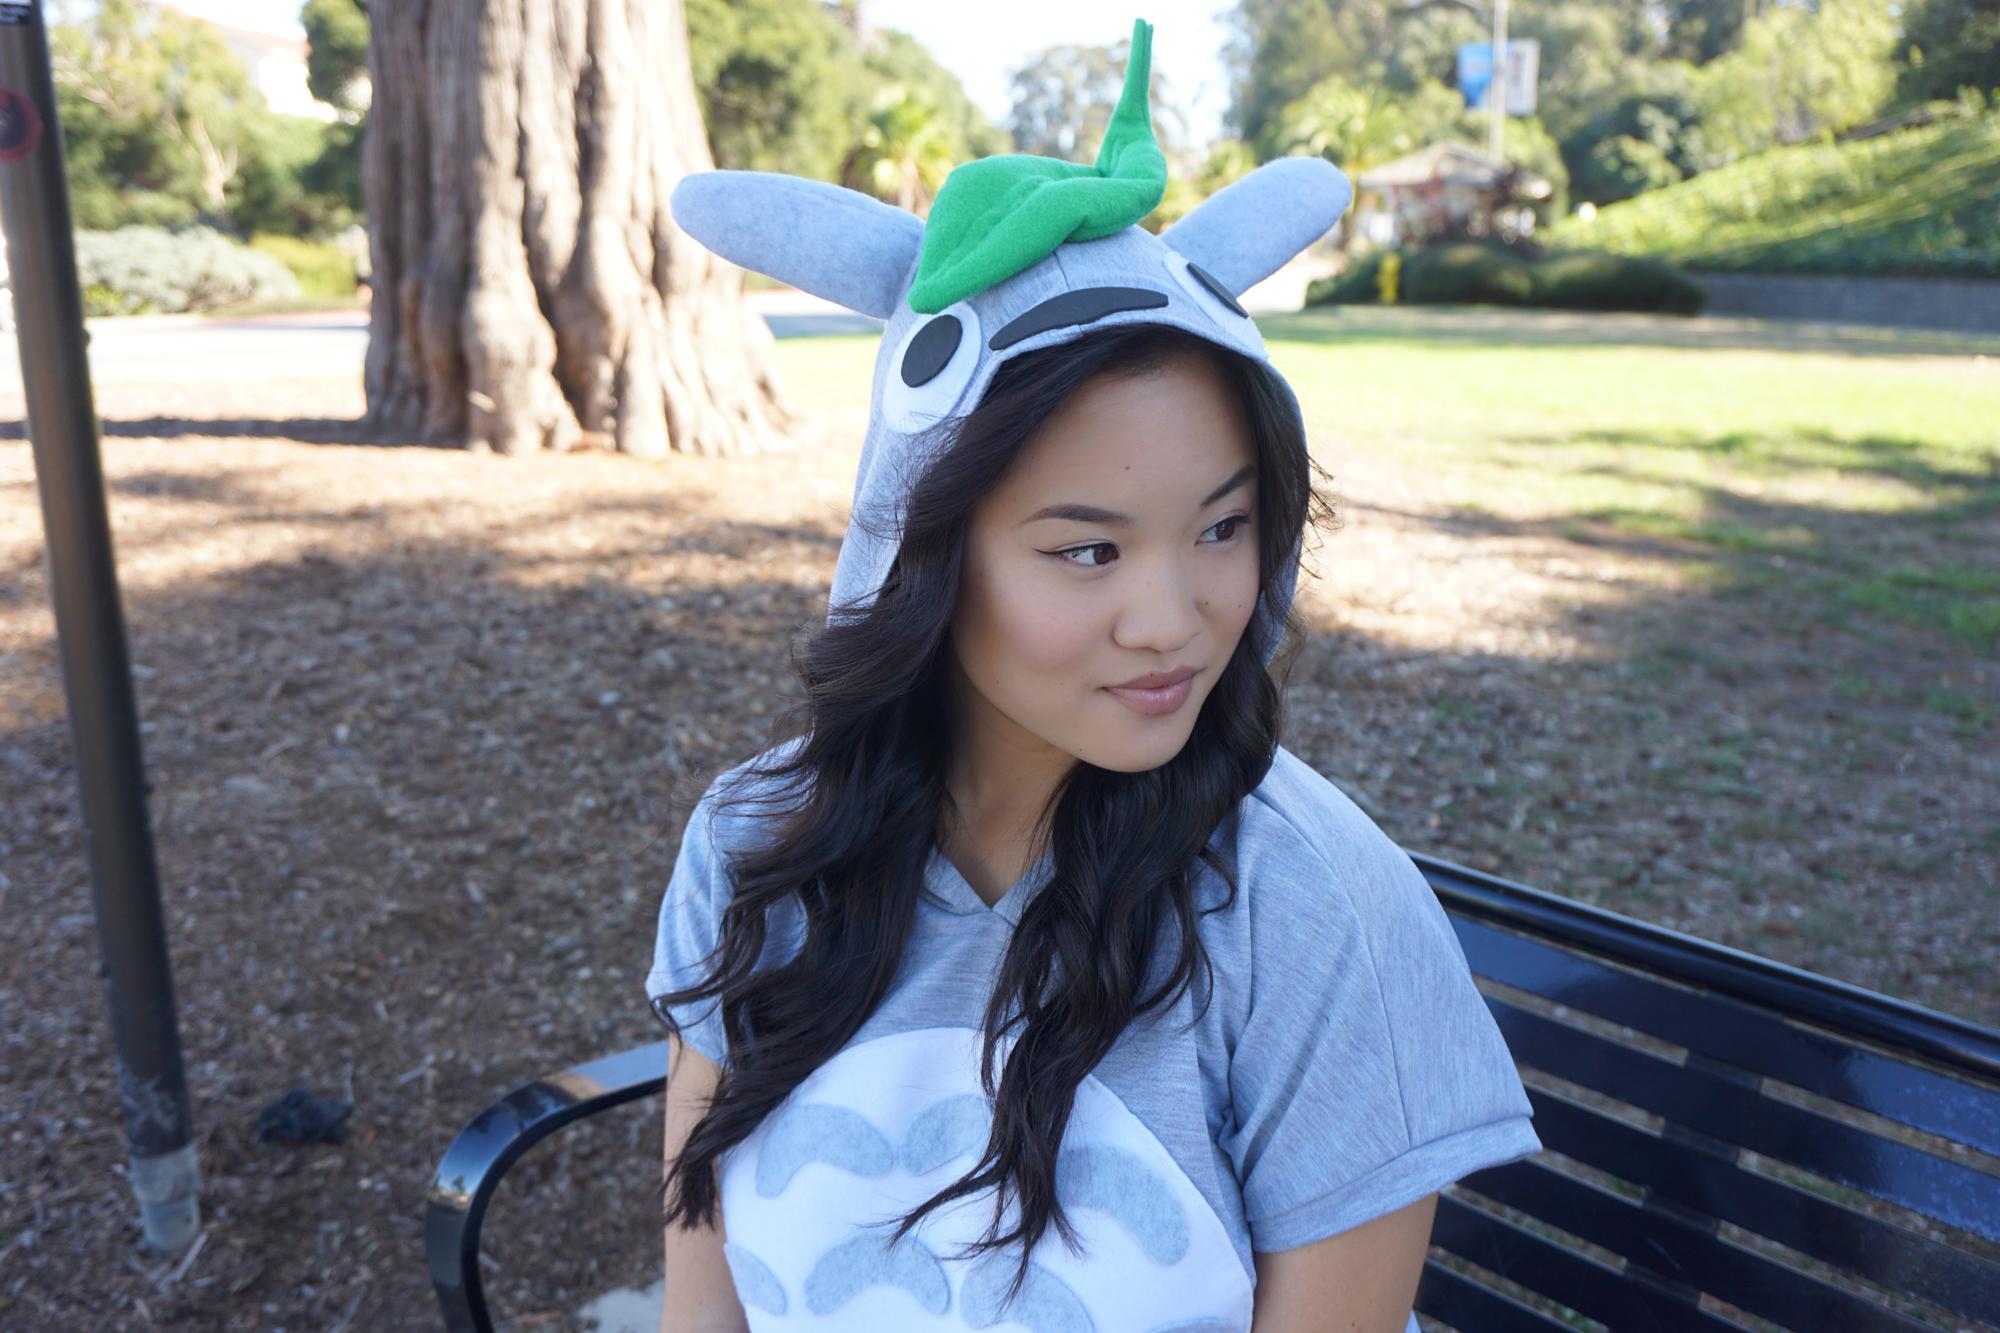 DIY Totoro Halloween Costume Tutorial by Broke and Cooking - www.brokeandcooking.com